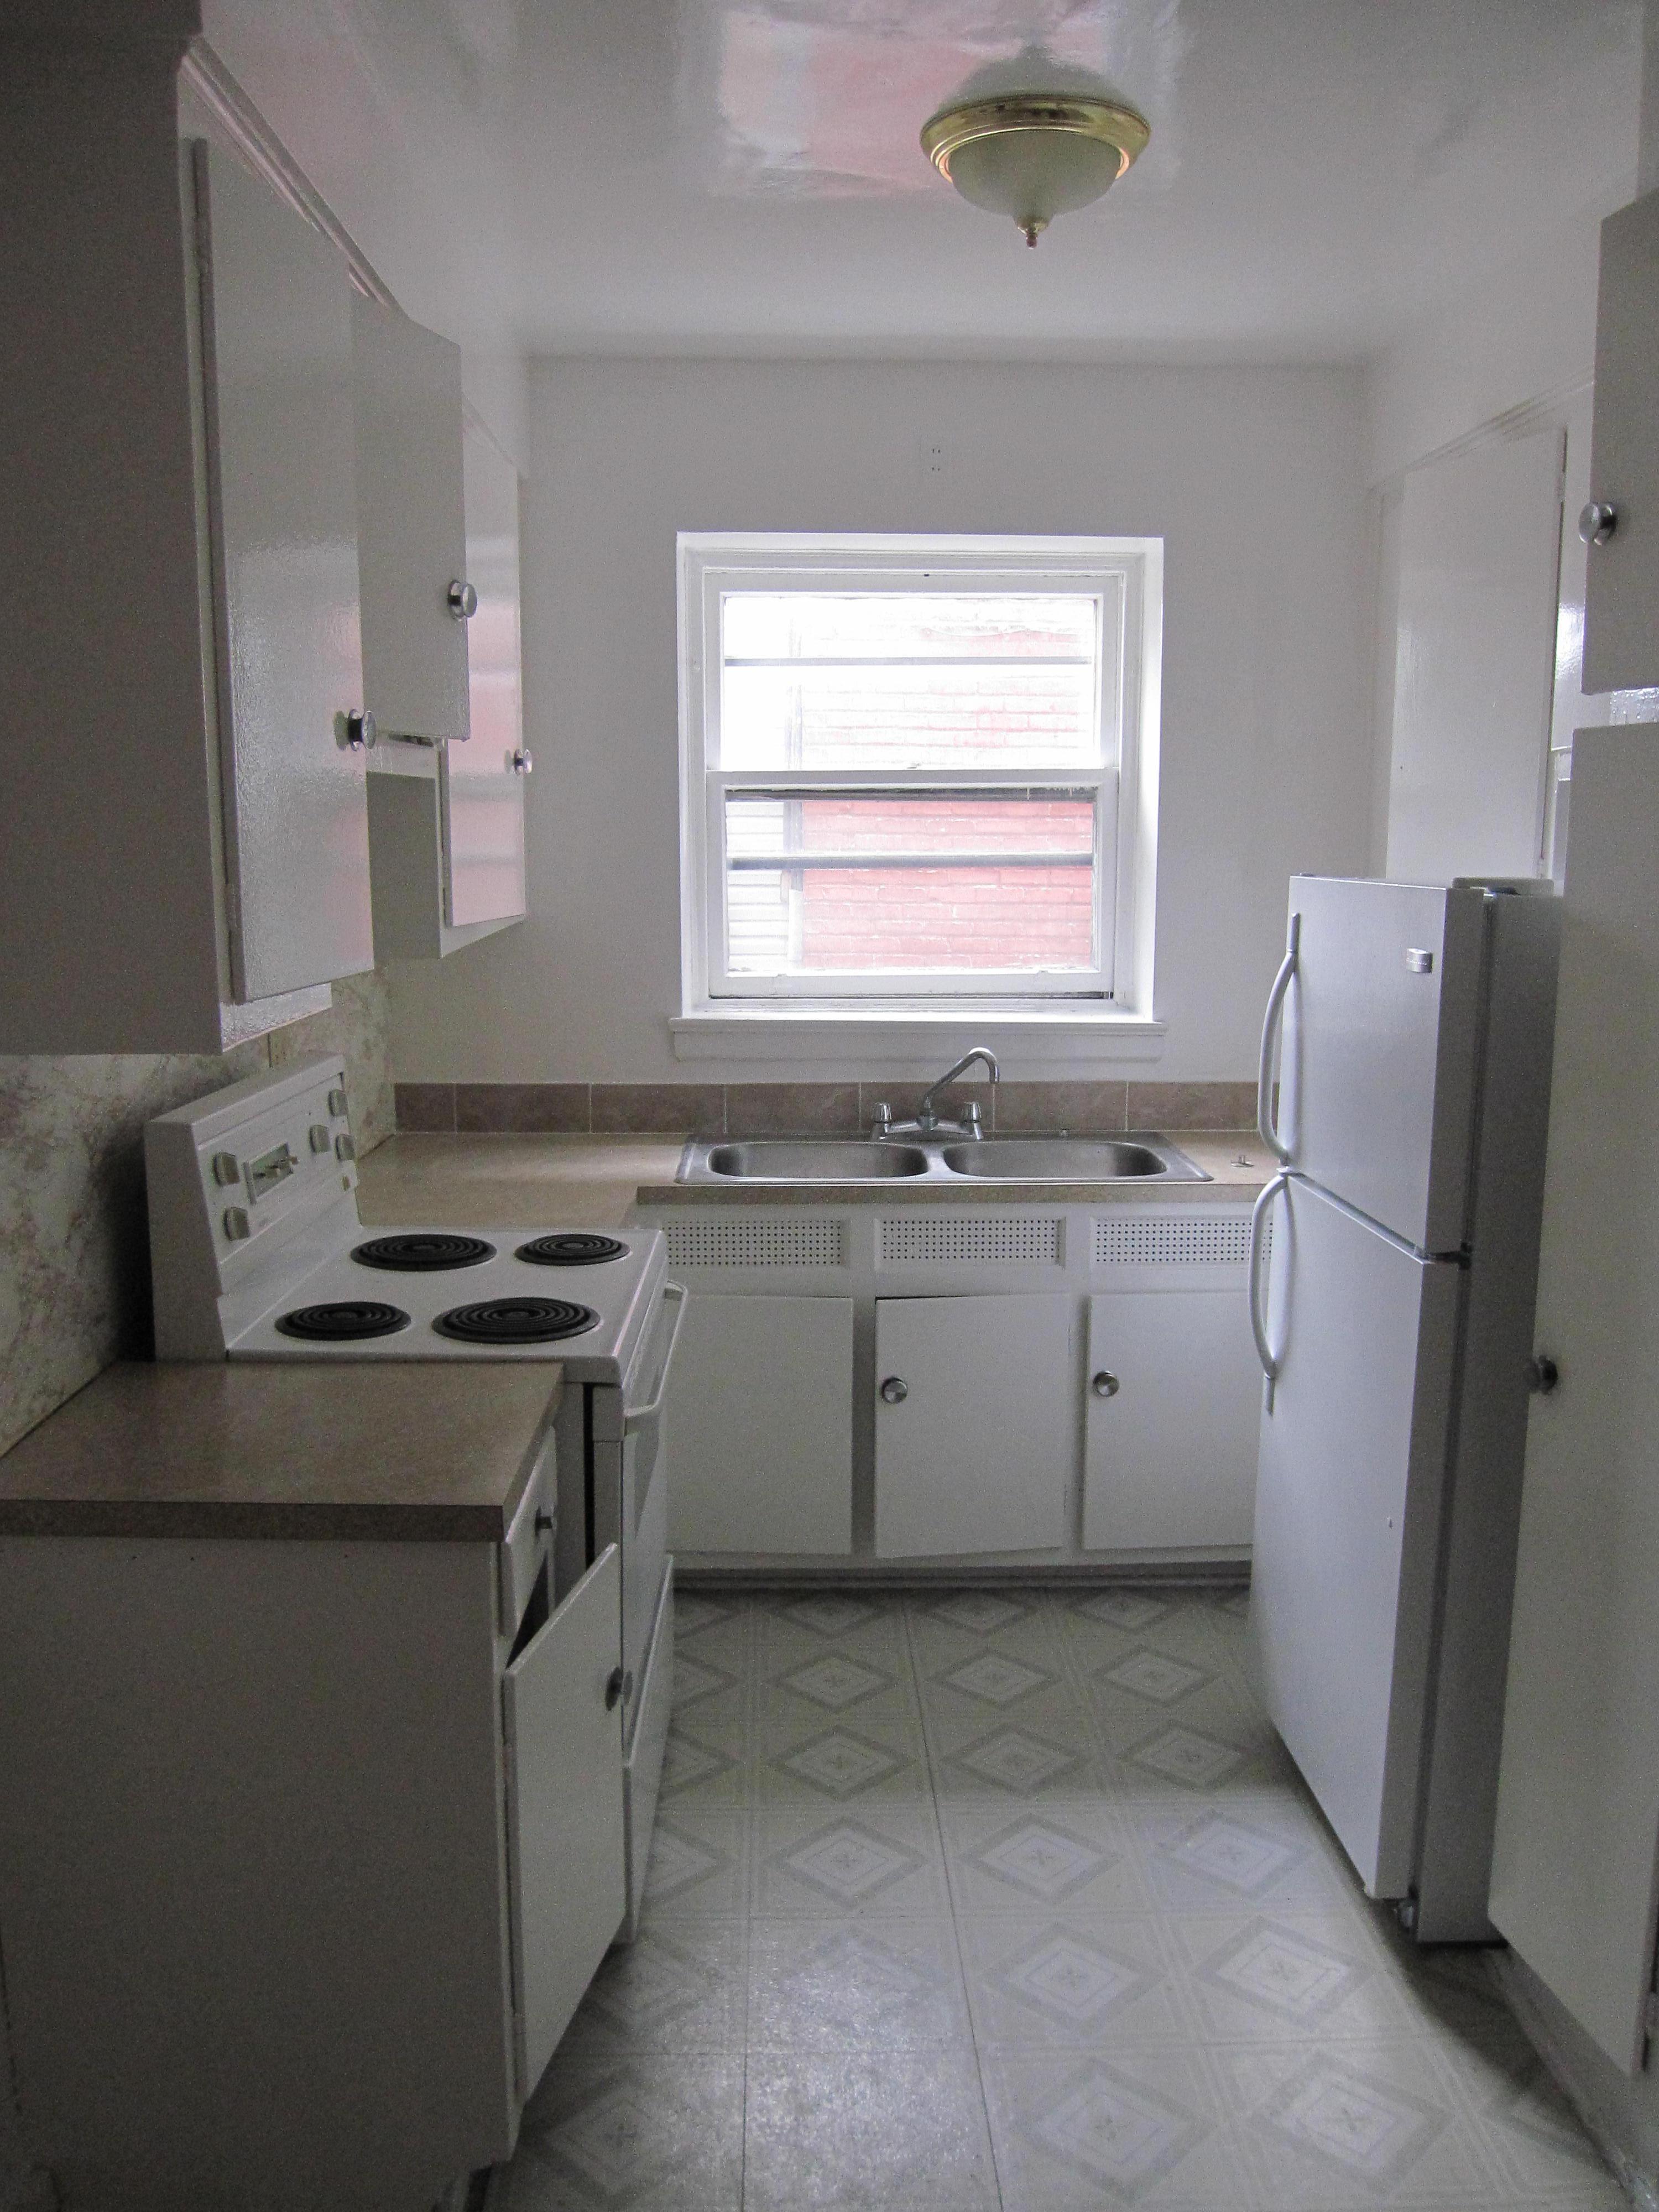 2 bedroom Apartments for rent in Notre-Dame-de-Grace at 4635 Clanranald - Photo 05 - RentersPages – L23639